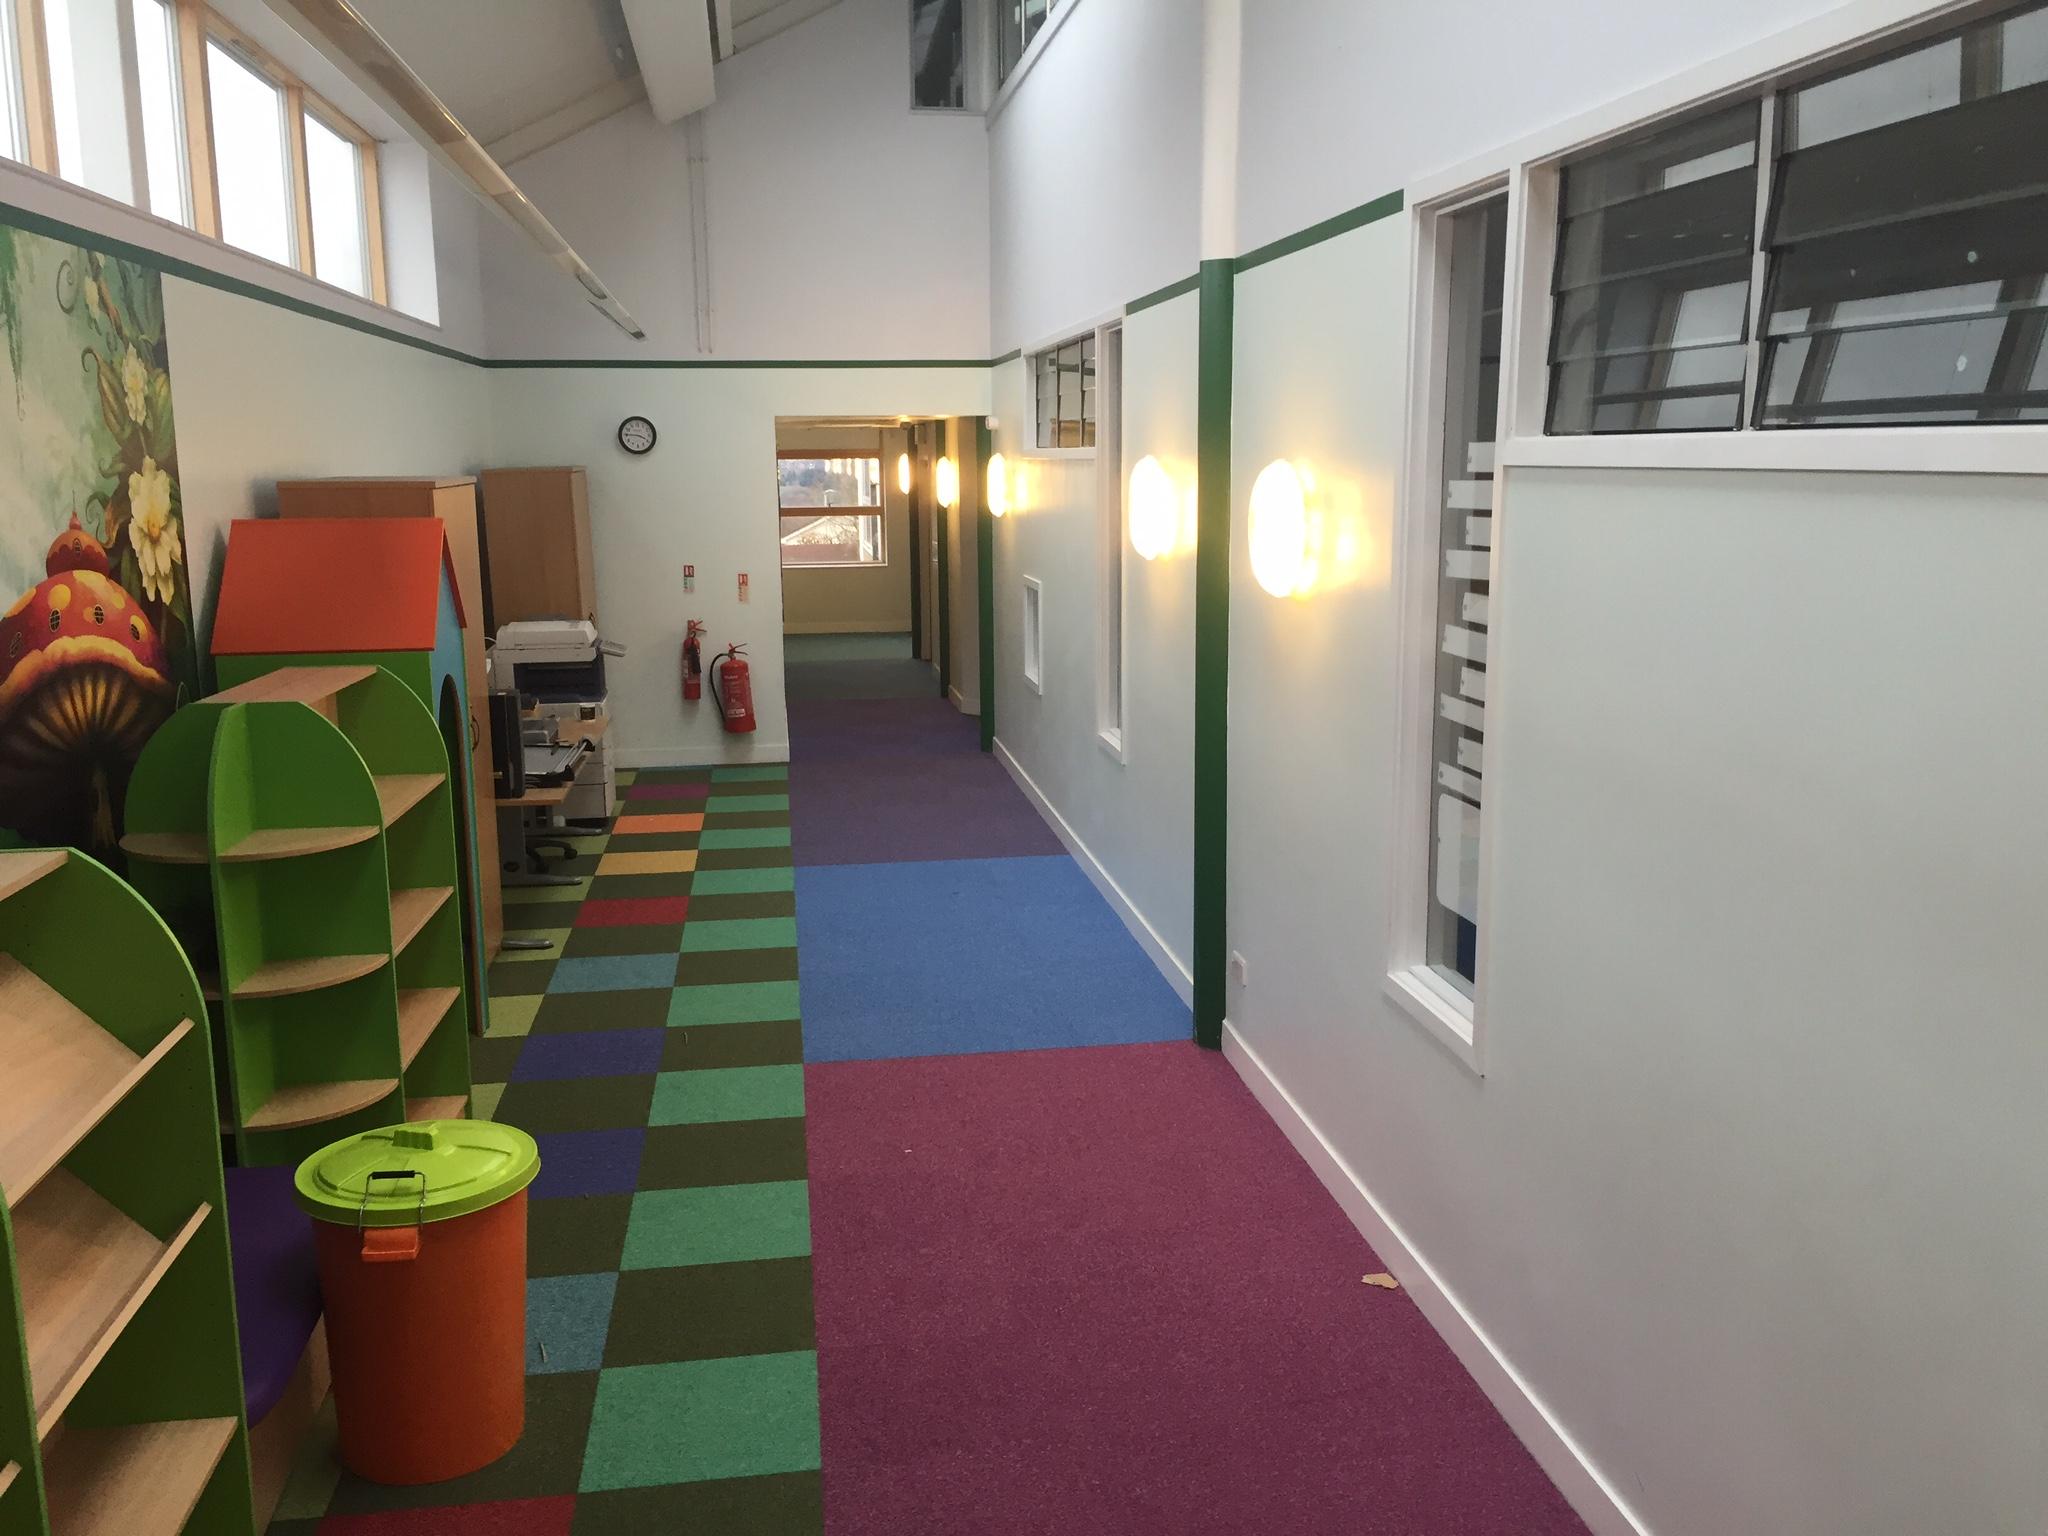 Carpet-Fit-Wales-Aberdare-South-Wales-Flooring-Carpets-LVT-Vinyl-Cleaning-Professional-School-Colourful schools